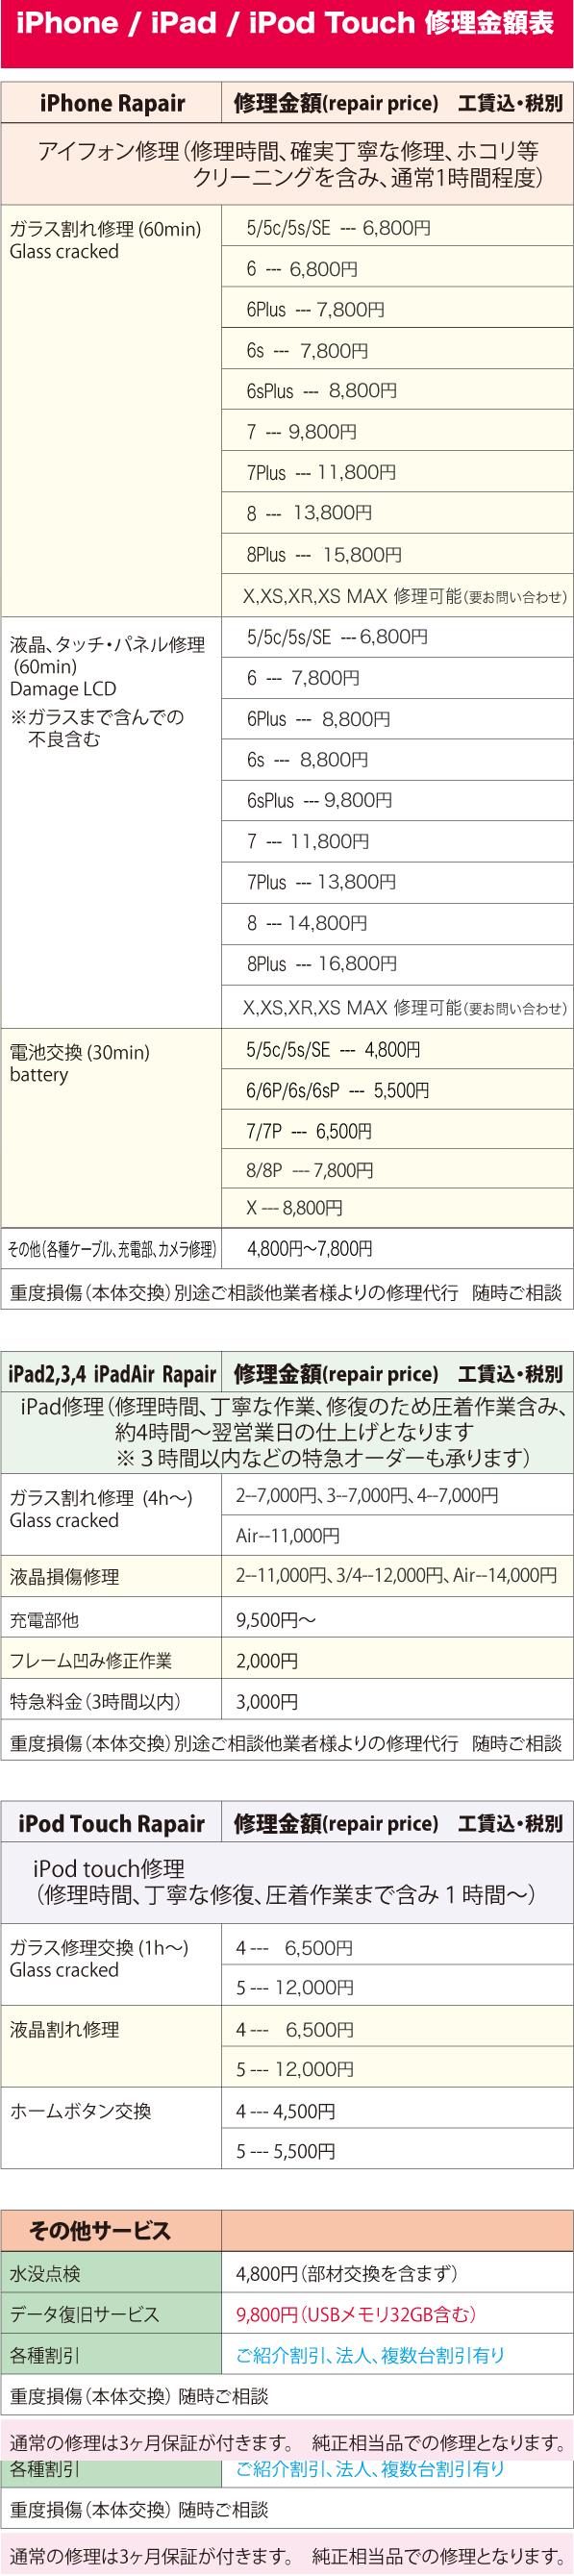 price190308.jpg